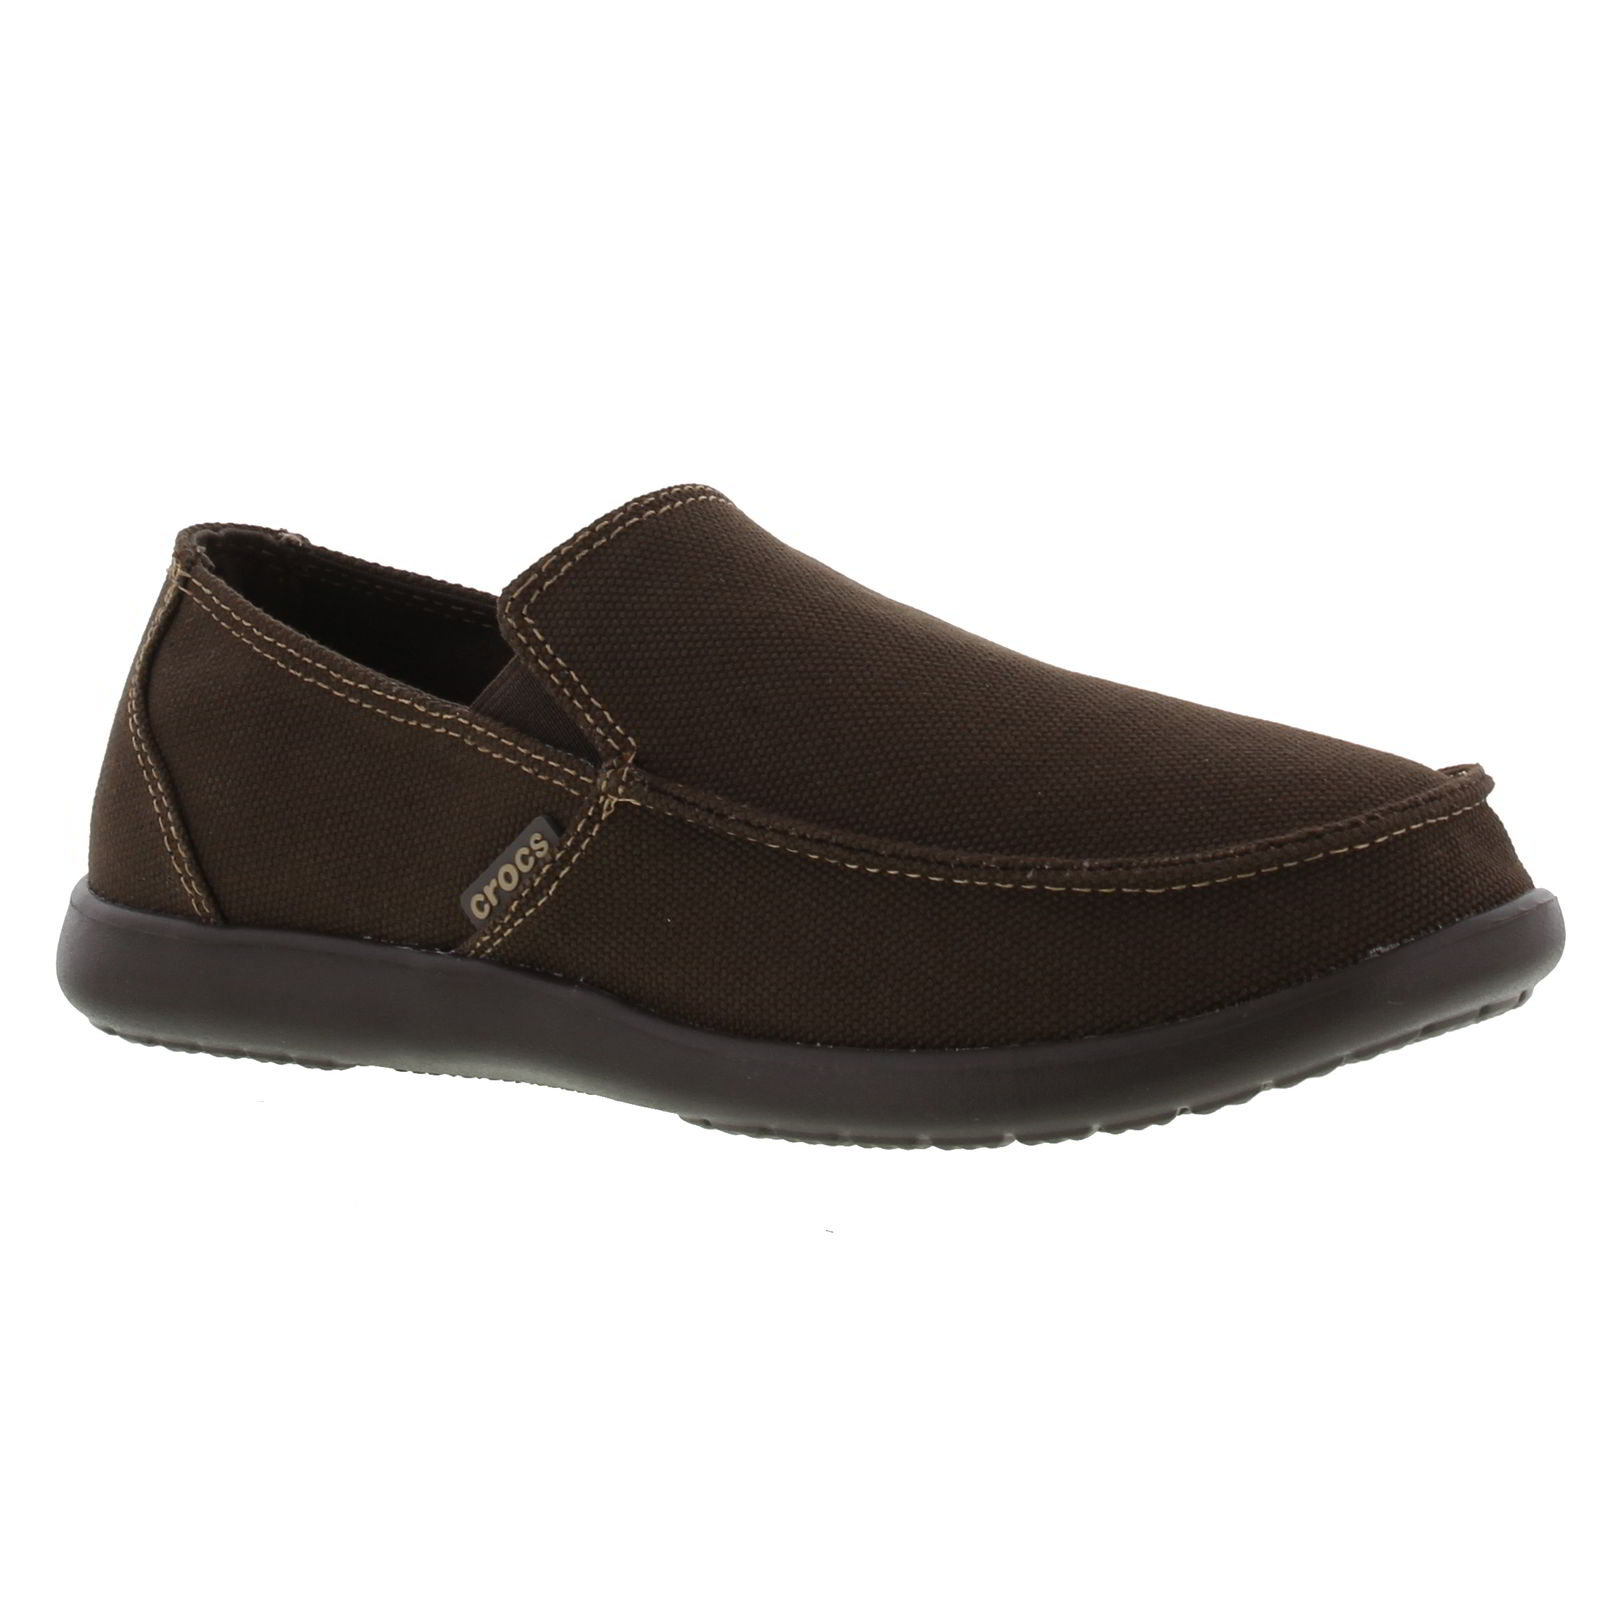 6ef11a9ed47b51 Details about Crocs Santa Cruz Clean Cut Loafer Mens Brown Slip On Shoes  Size UK 7-12